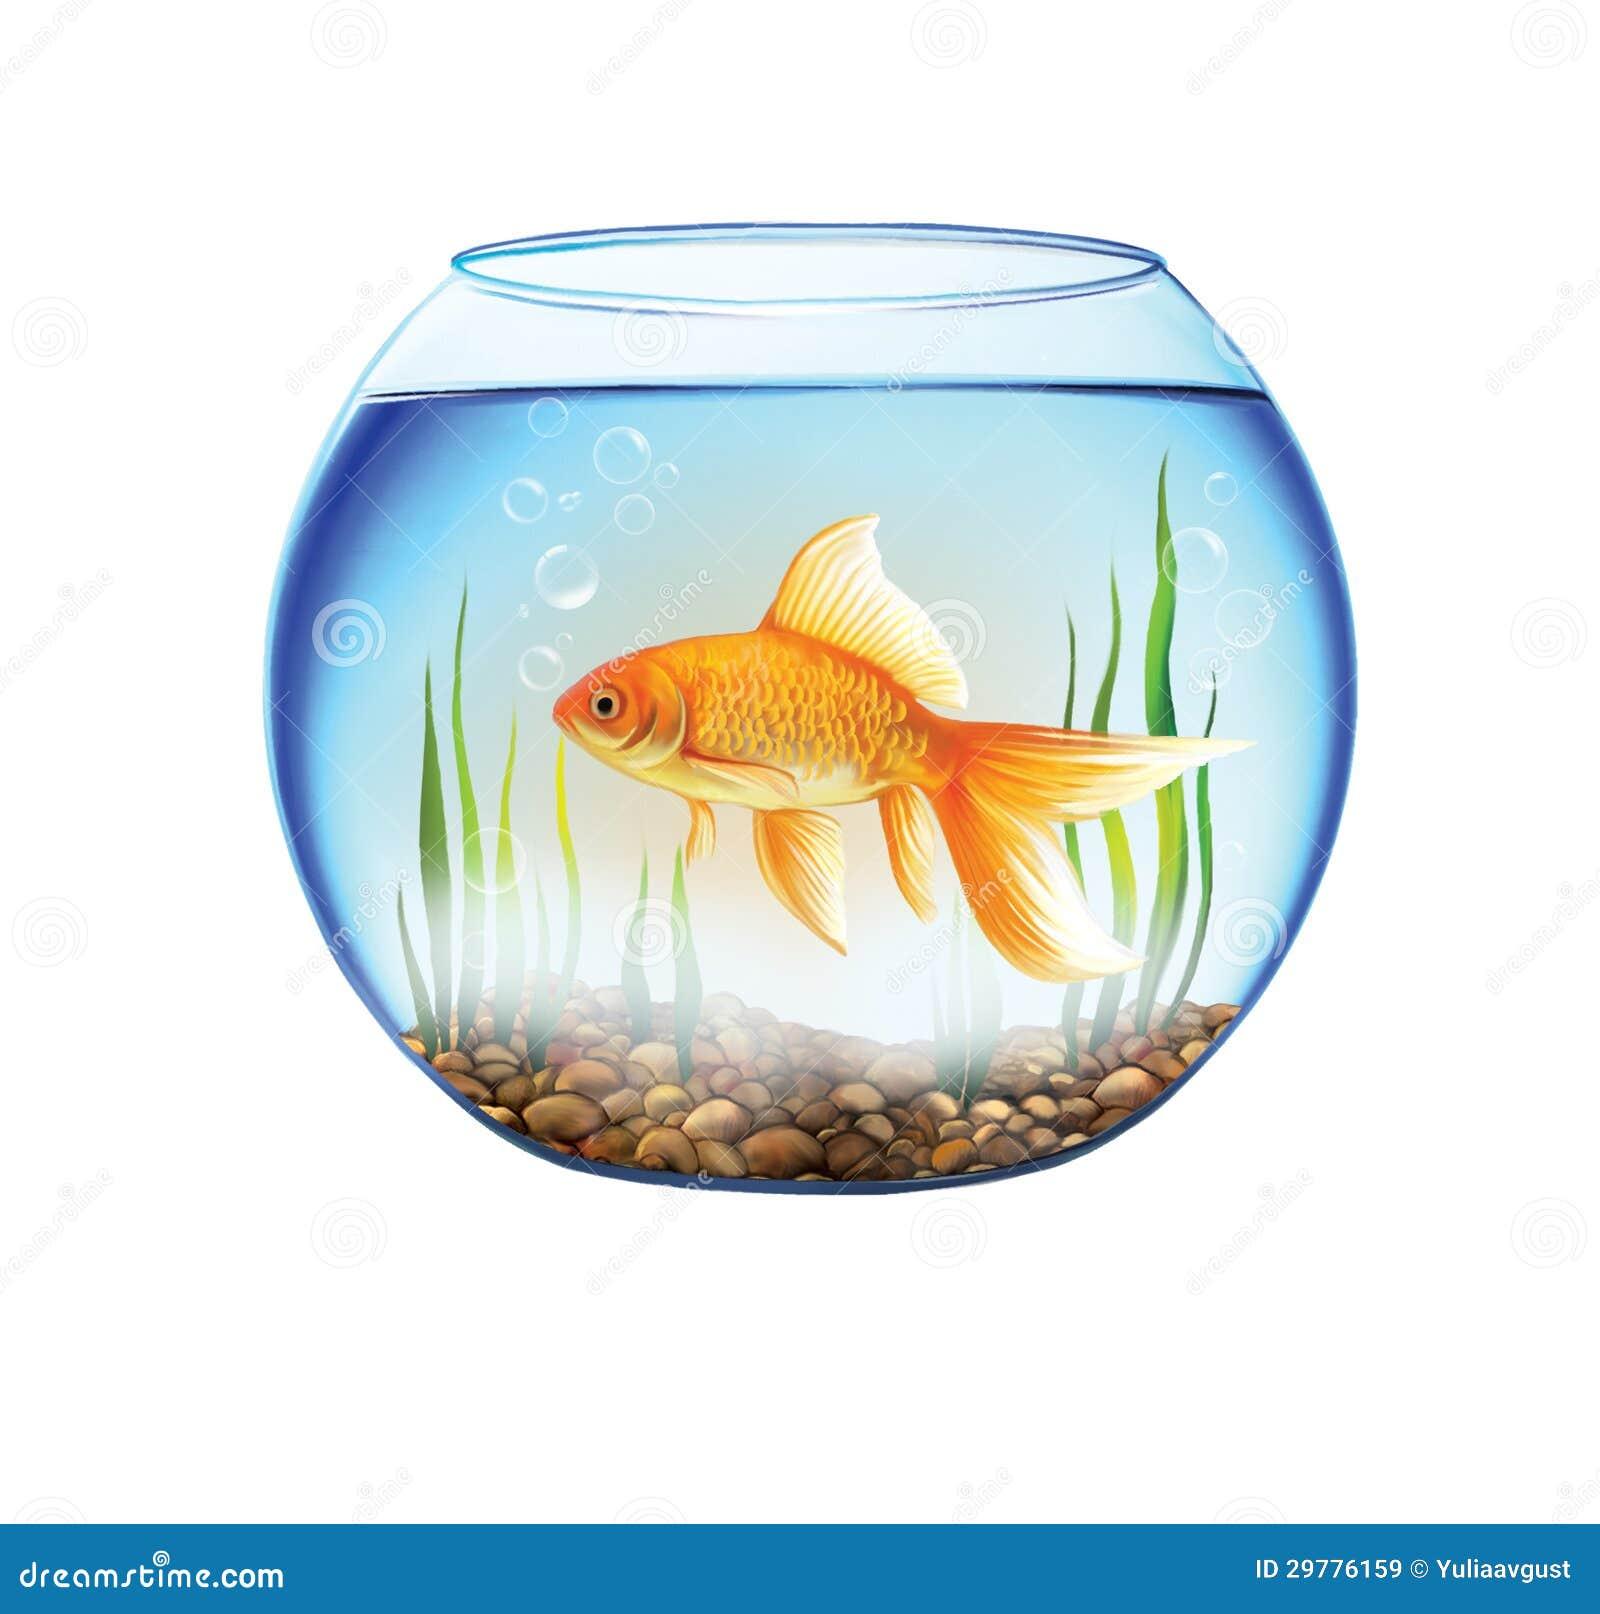 Gold fish in a round aquarium fish bowl royalty free for Fish bowl aquarium